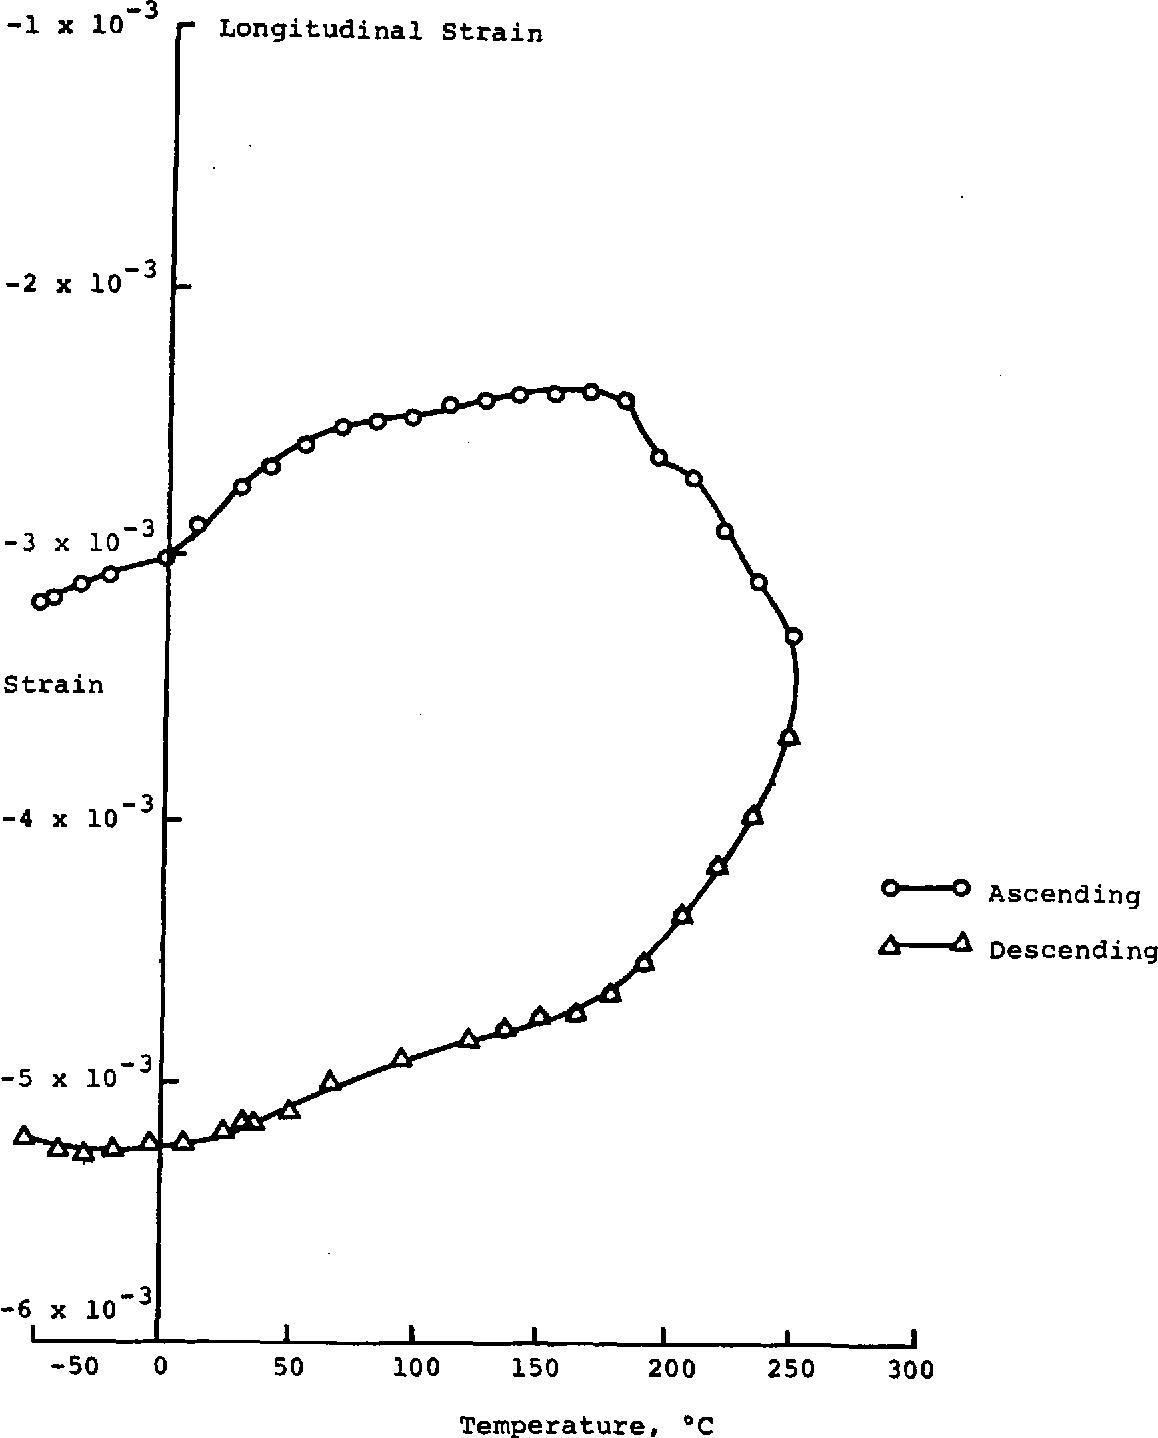 Figure 5: Longitudinal Strain (E = -1473 N (-150 kg) PO - ~g) ver.sus Temperature Load =11 = -35.37 Wa